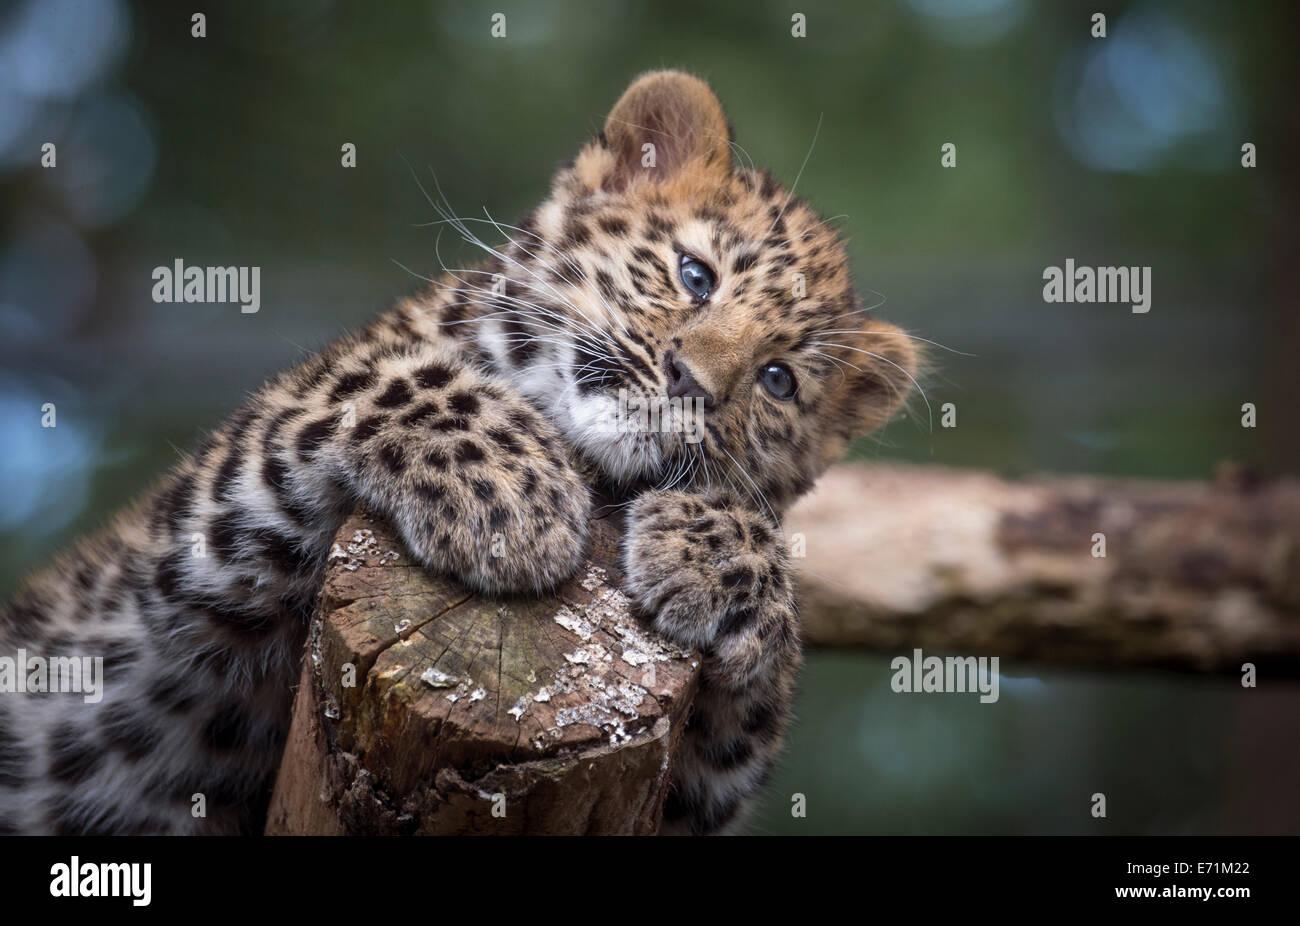 Female Amur leopard cub looking cute - Stock Image